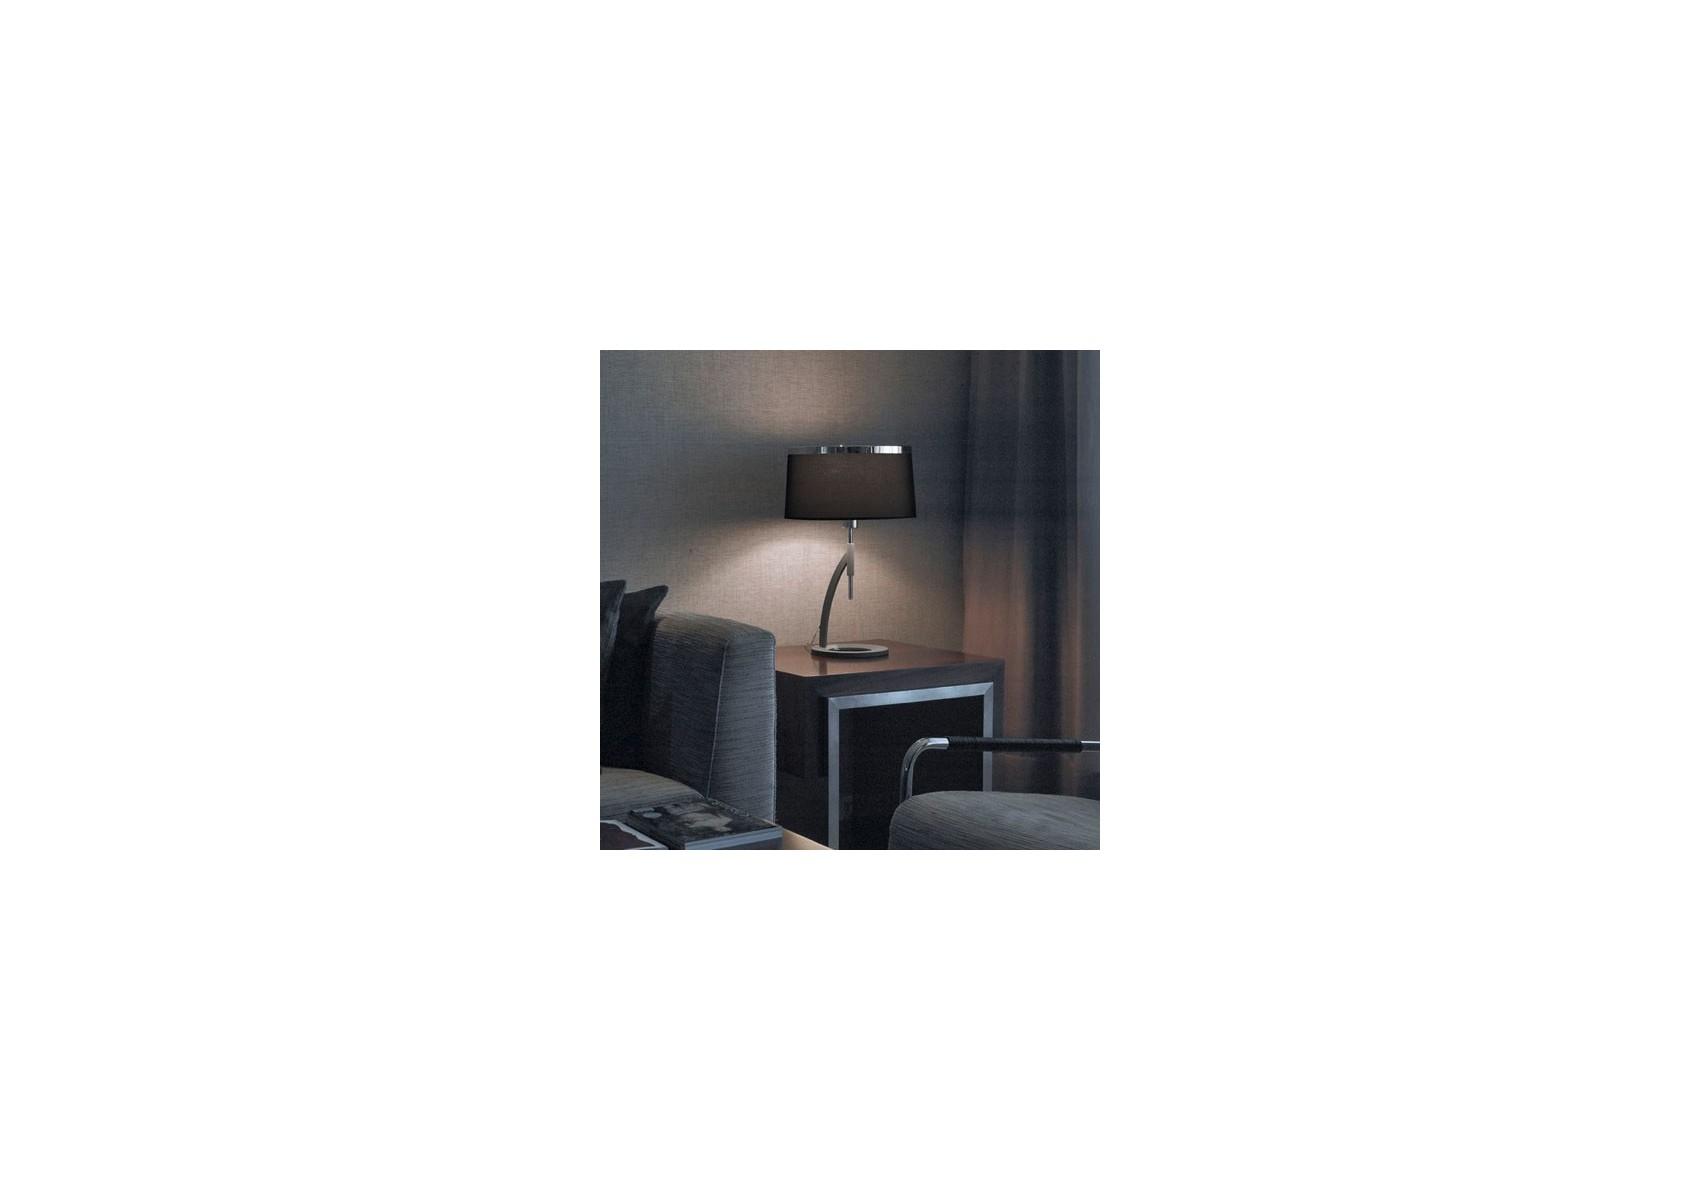 Design Boite Lampe Virginia À Poser gyb7vIYf6m